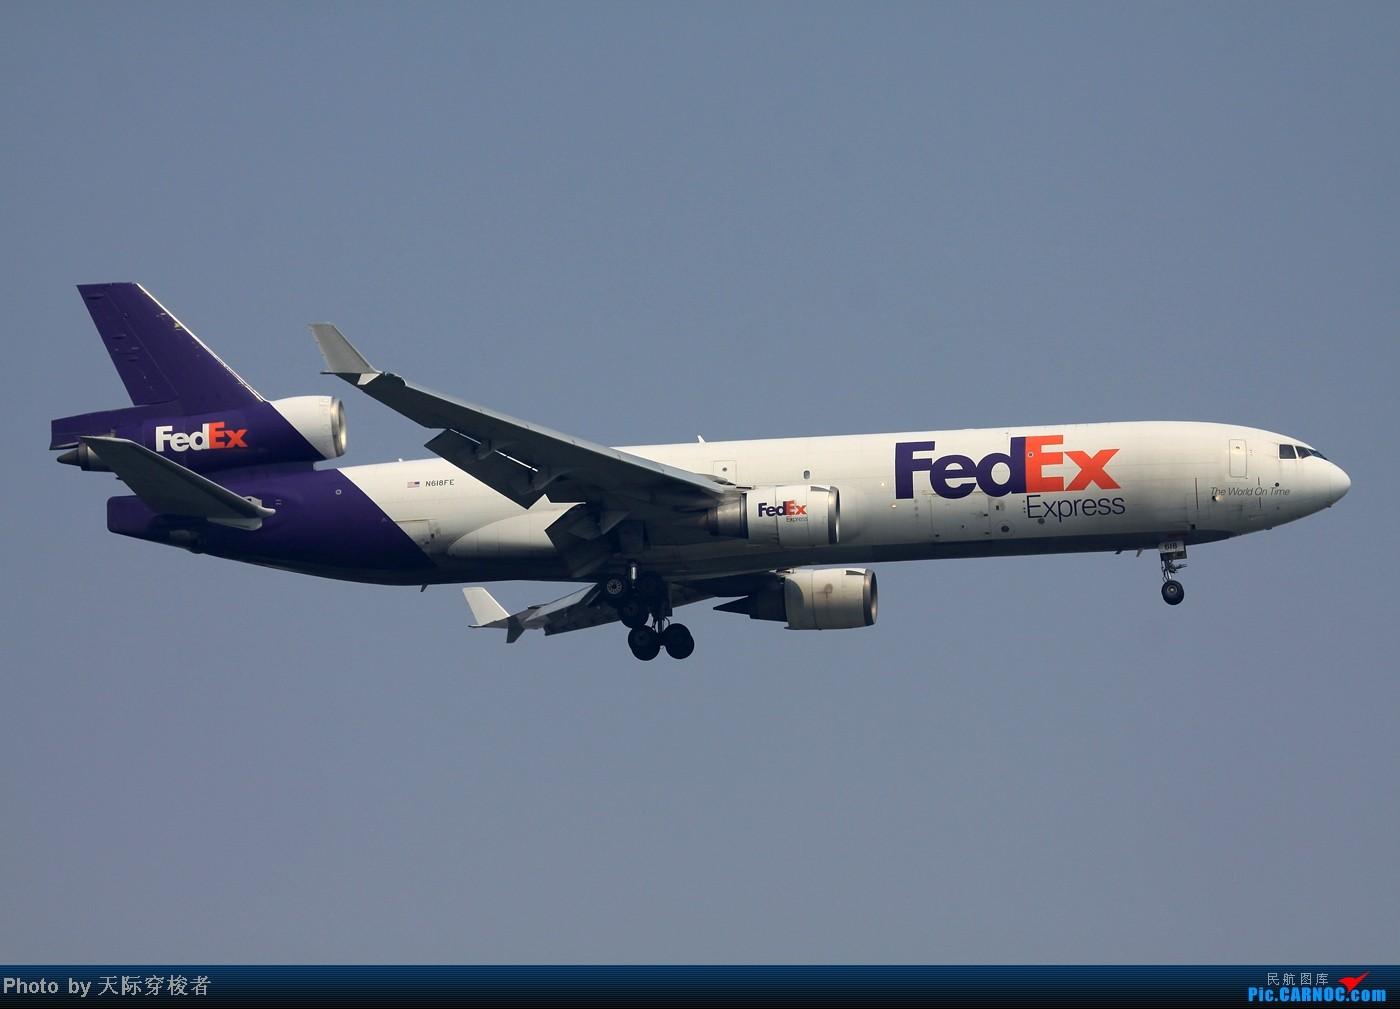 Re:[原创]三个月从返浦东 空客波音上一组 MCDONNELL DOUGLAS MD-11 N618FE 上海浦东国际机场